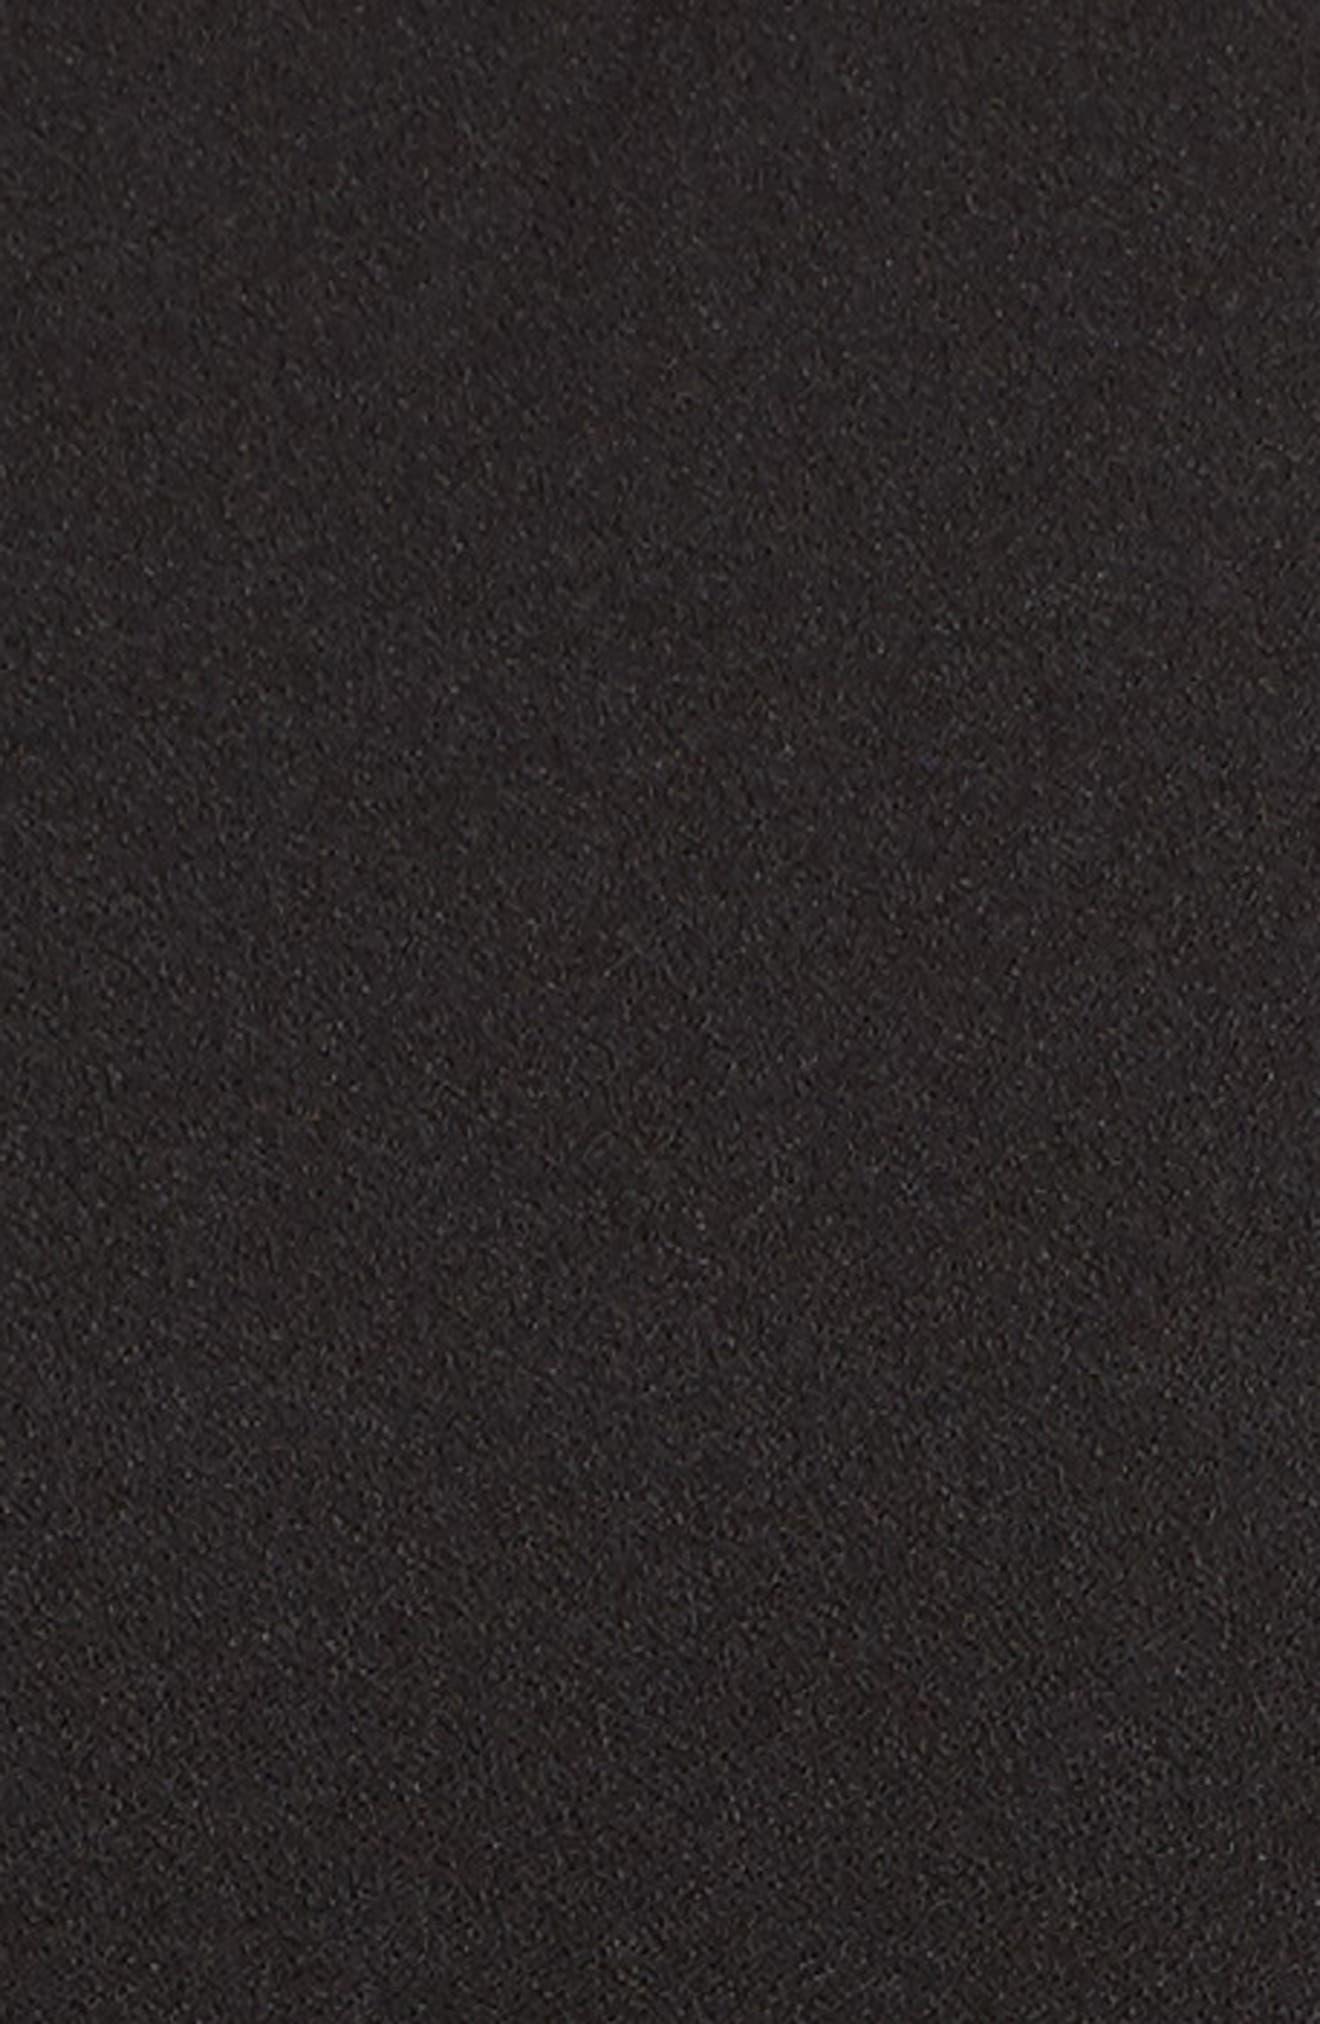 LULUS, Moment for Life Halter Jumpsuit, Alternate thumbnail 6, color, BLACK